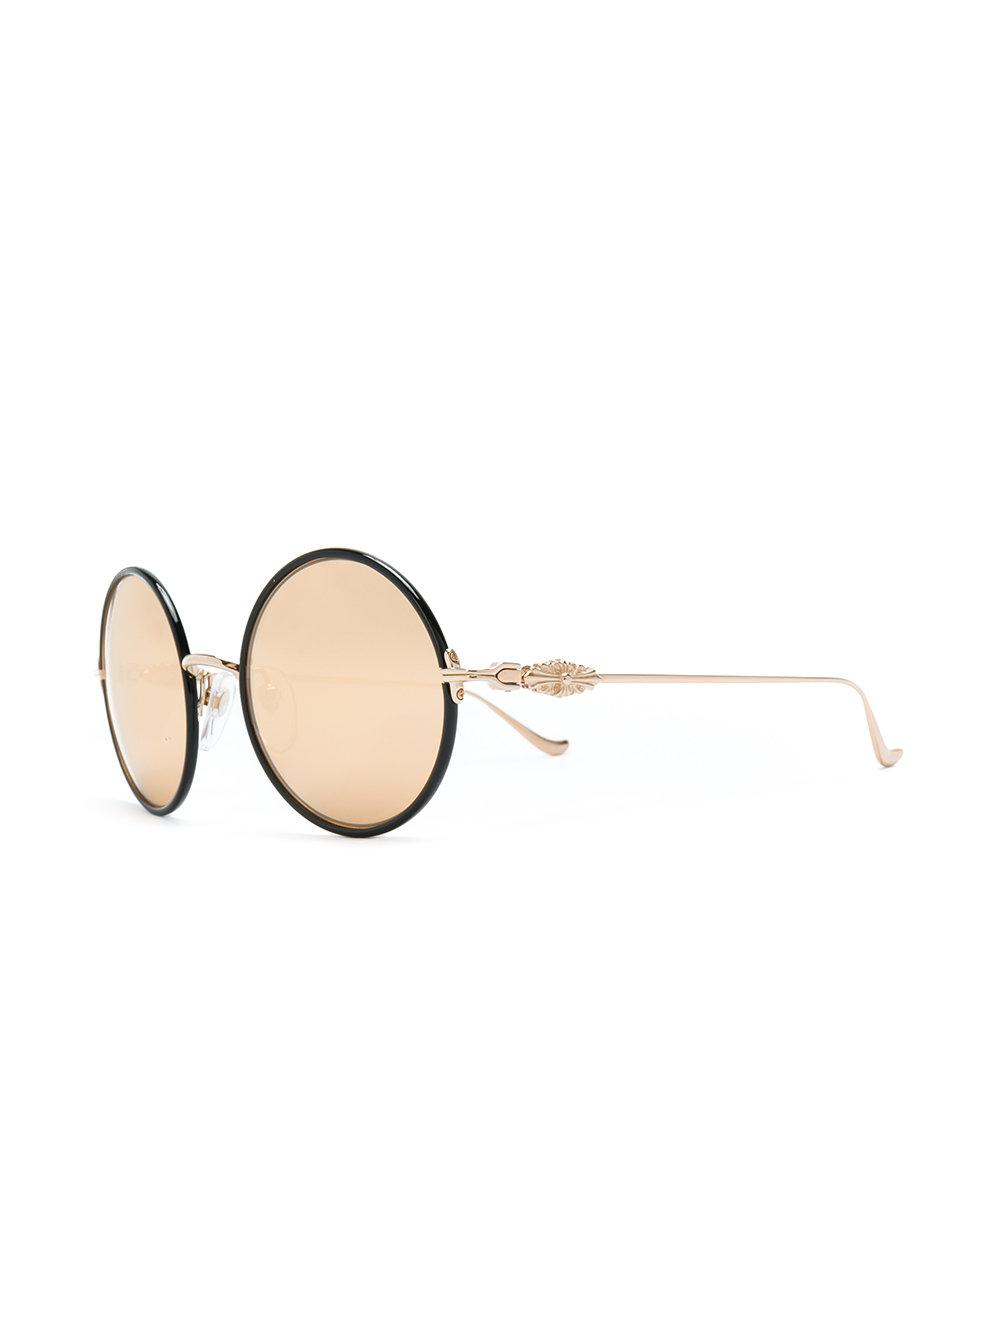 74d714efce Lyst - Chrome Hearts Round Frame Sunglasses